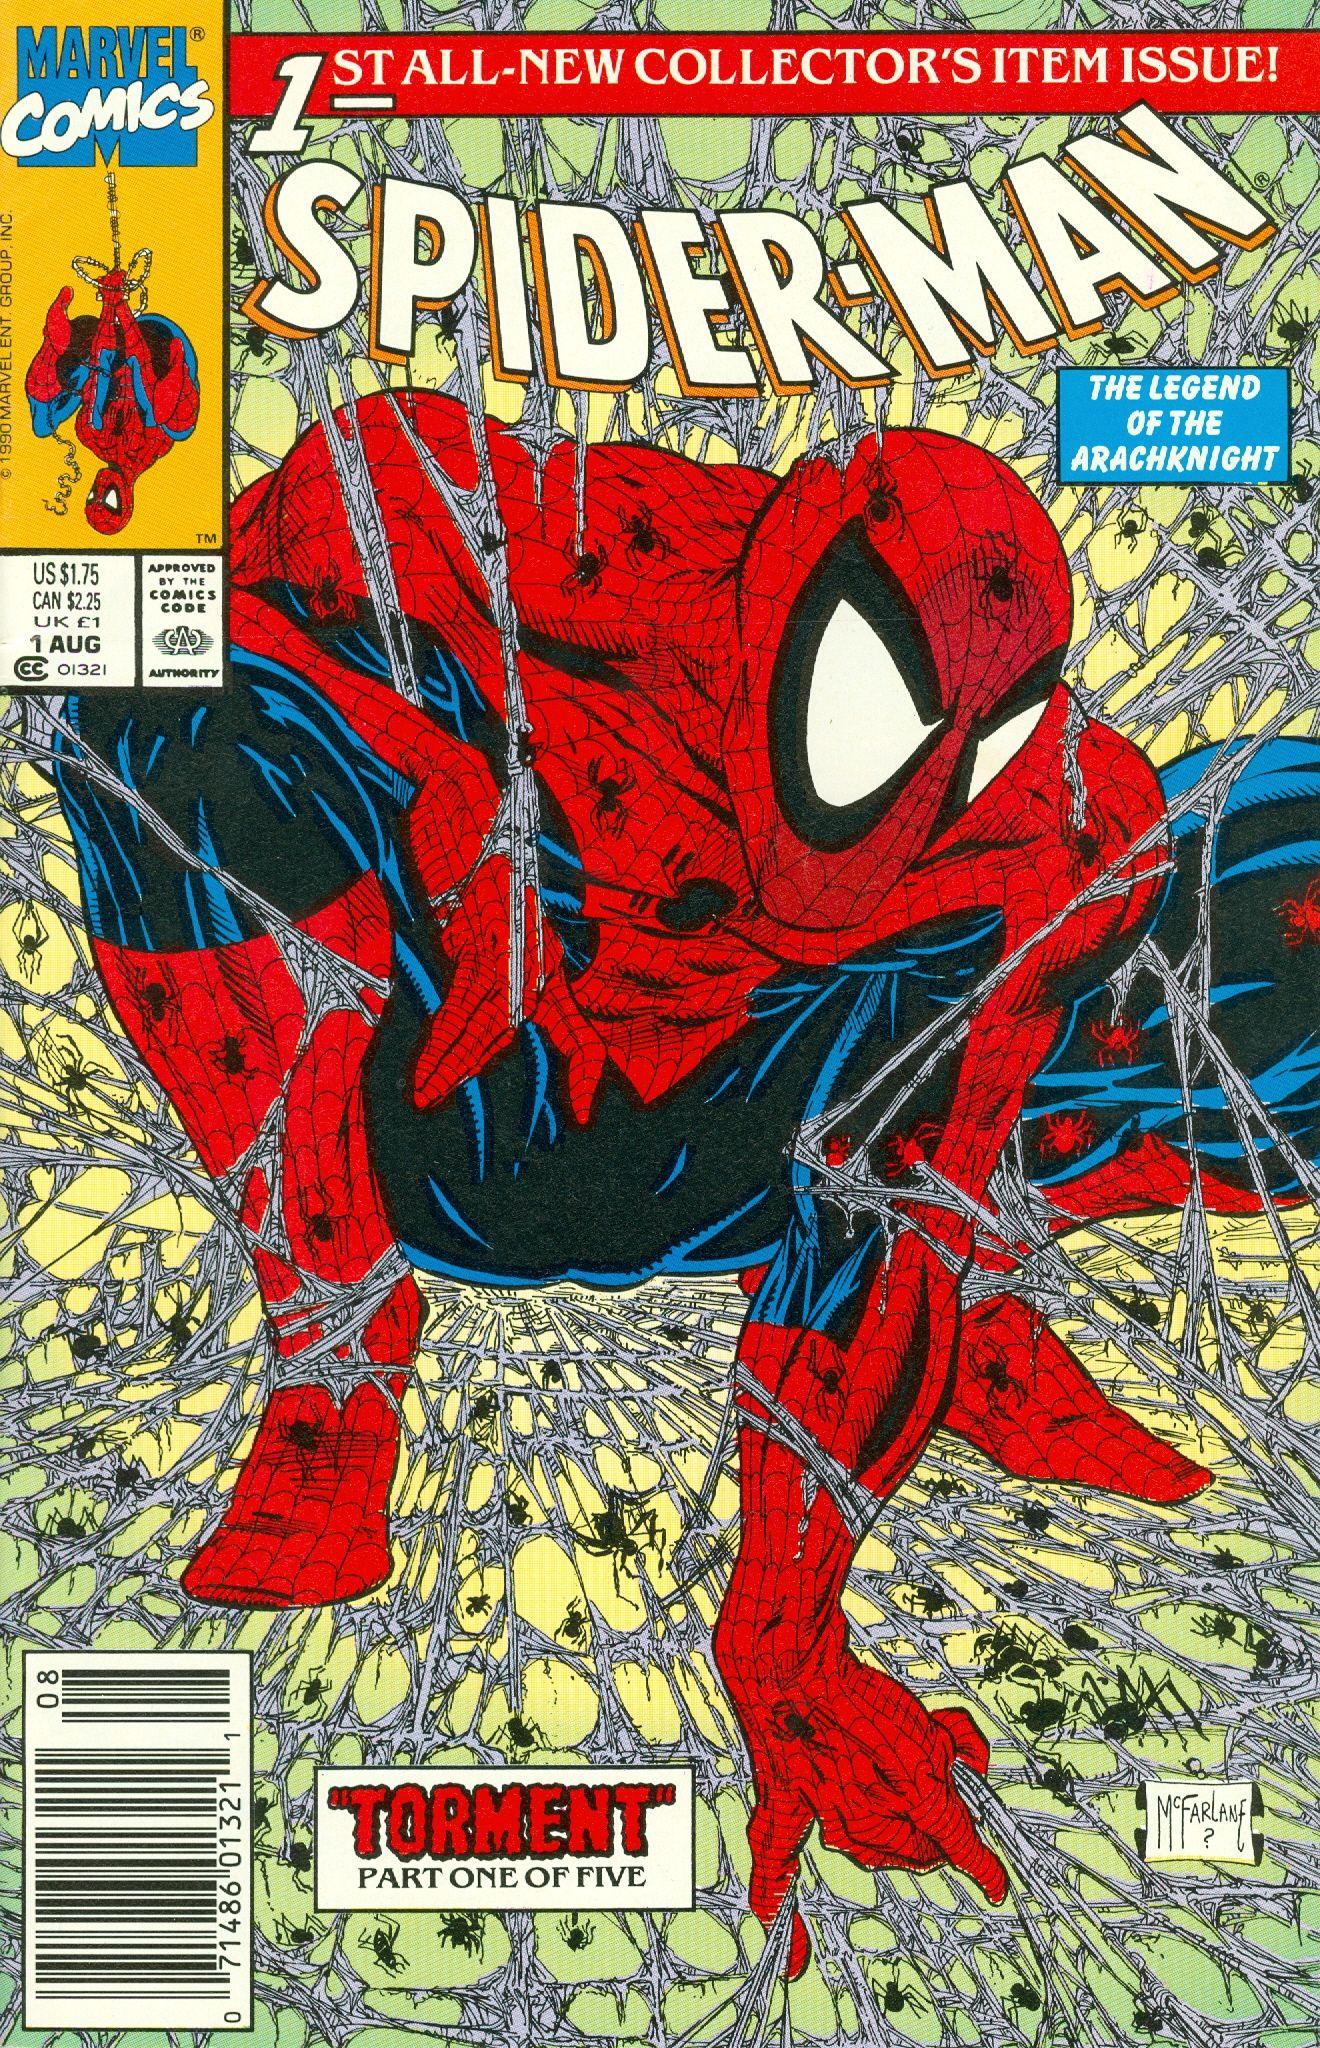 Spiderman Cover #comics - Organize In #KlaserApp